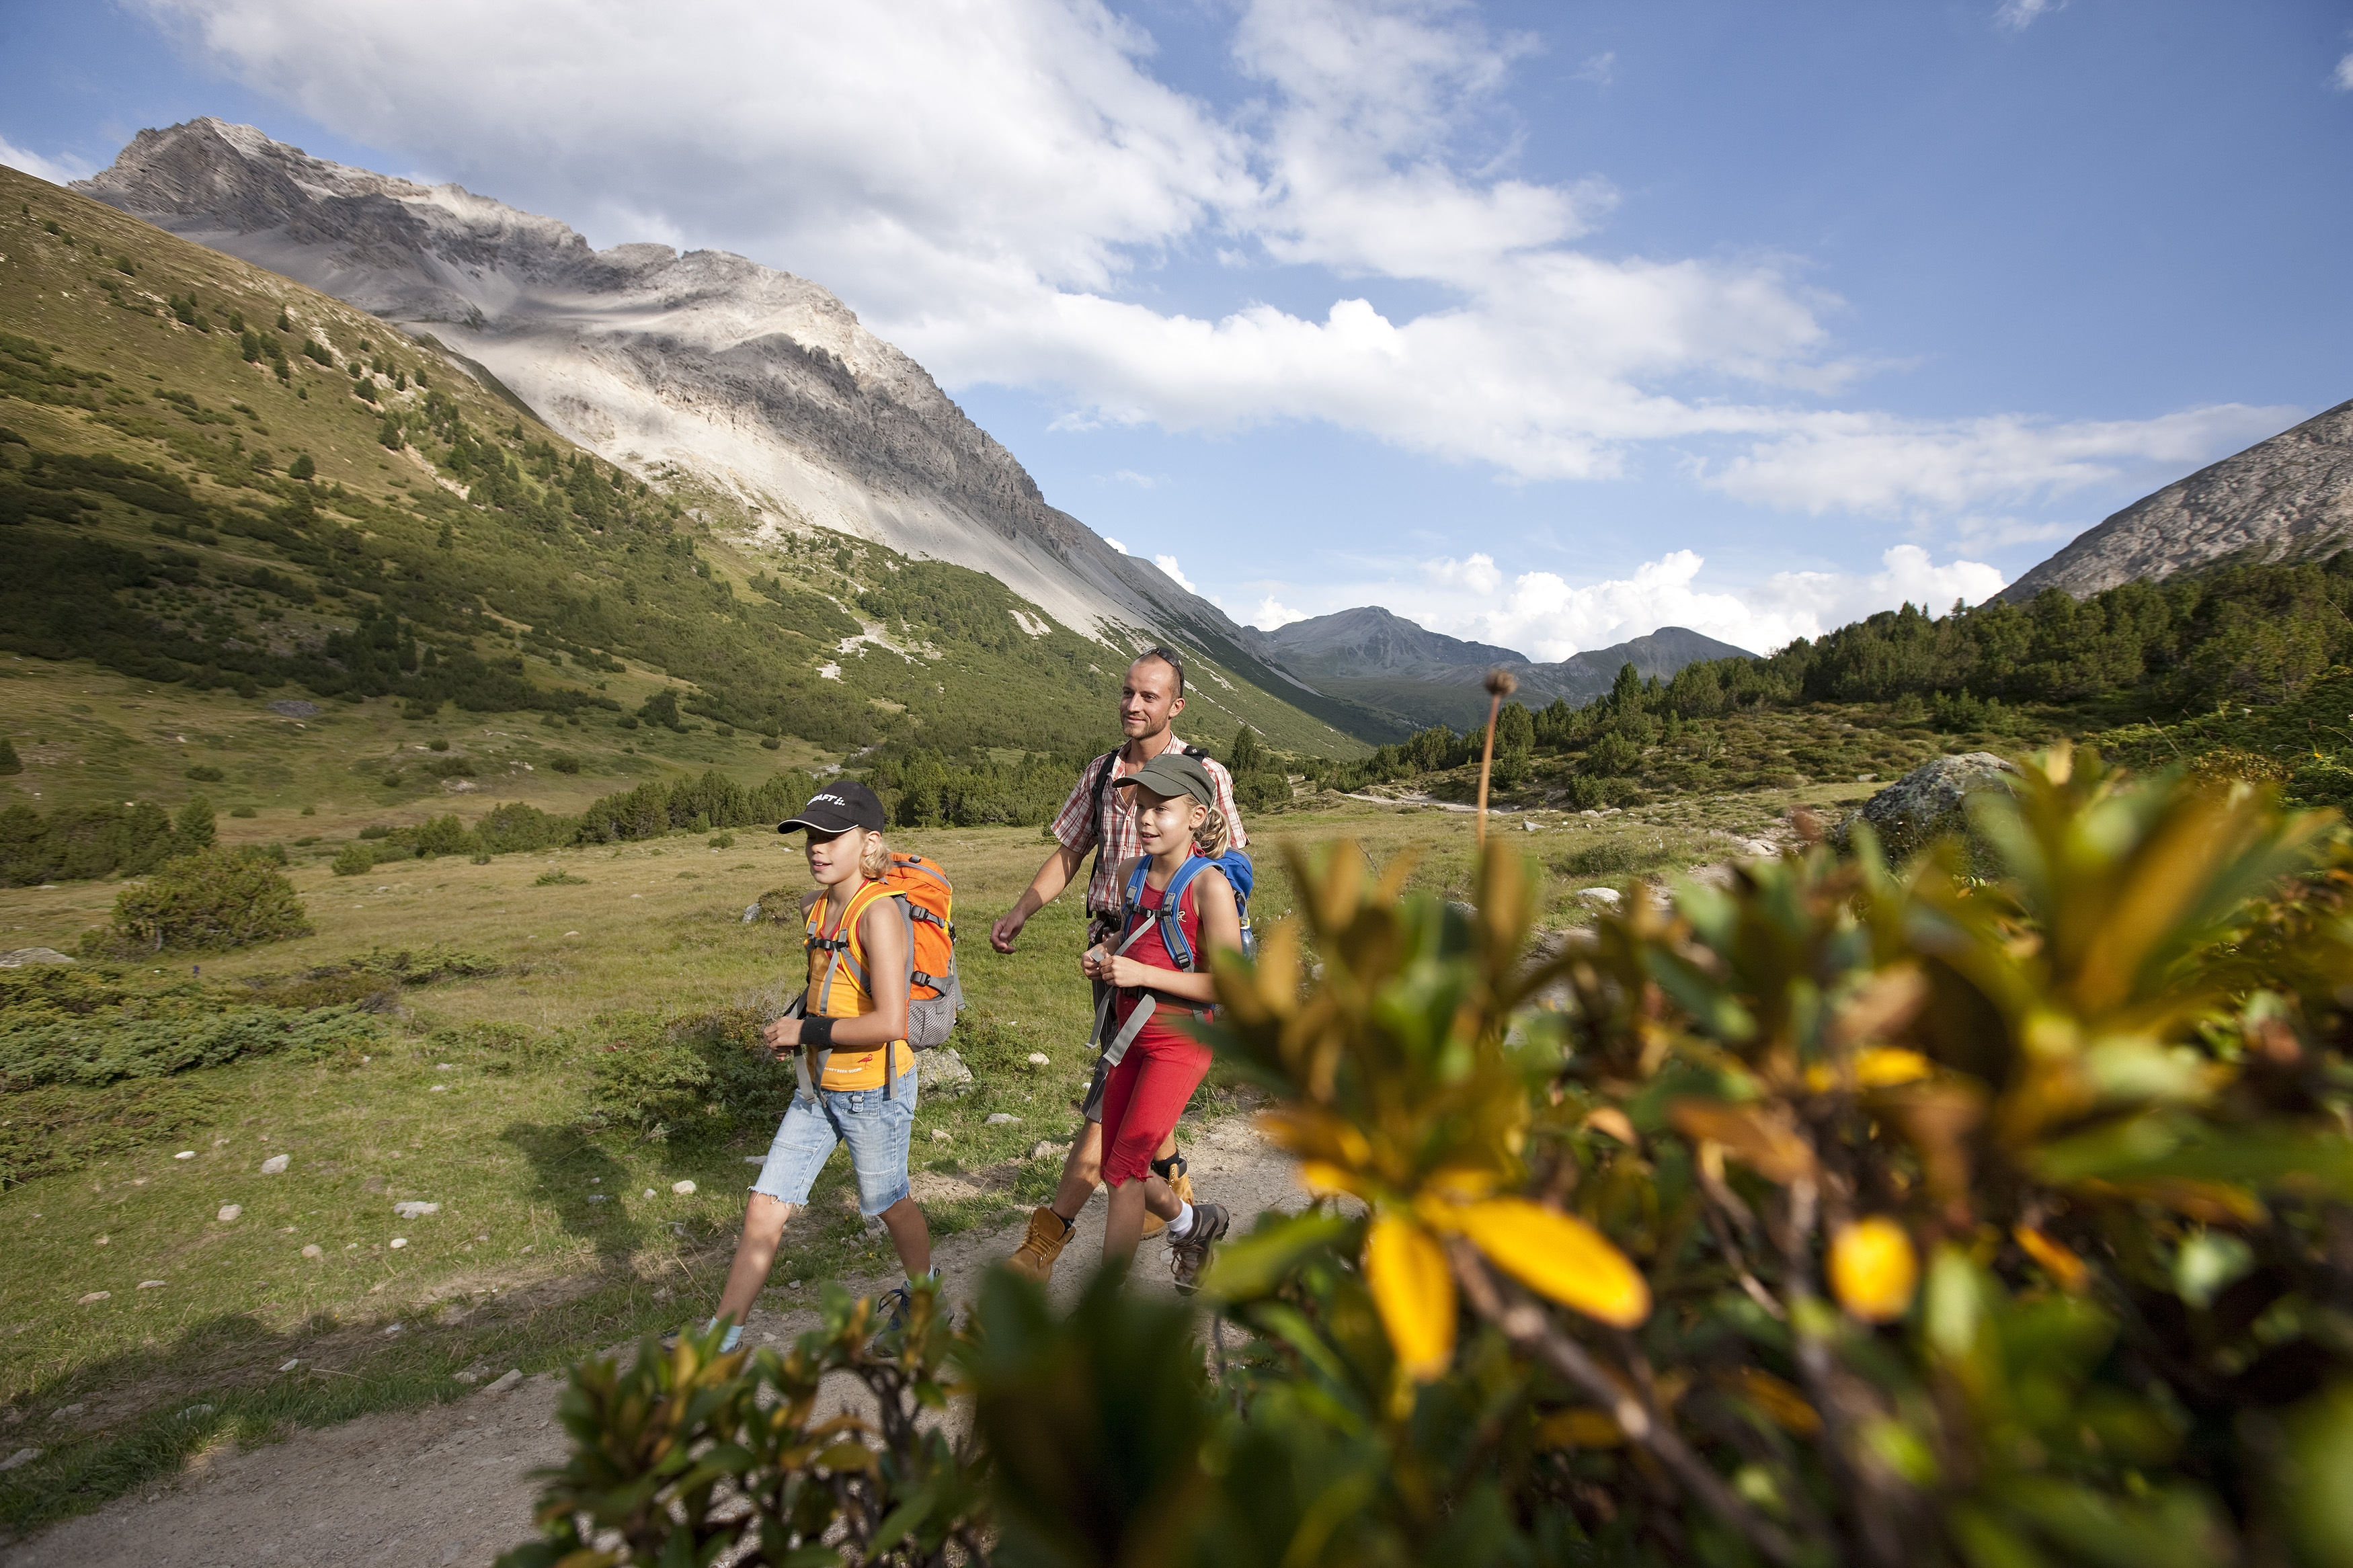 maletg simbolic: Tranter auter vegn la Svizra ludada per la legislaziun da l'ambient.